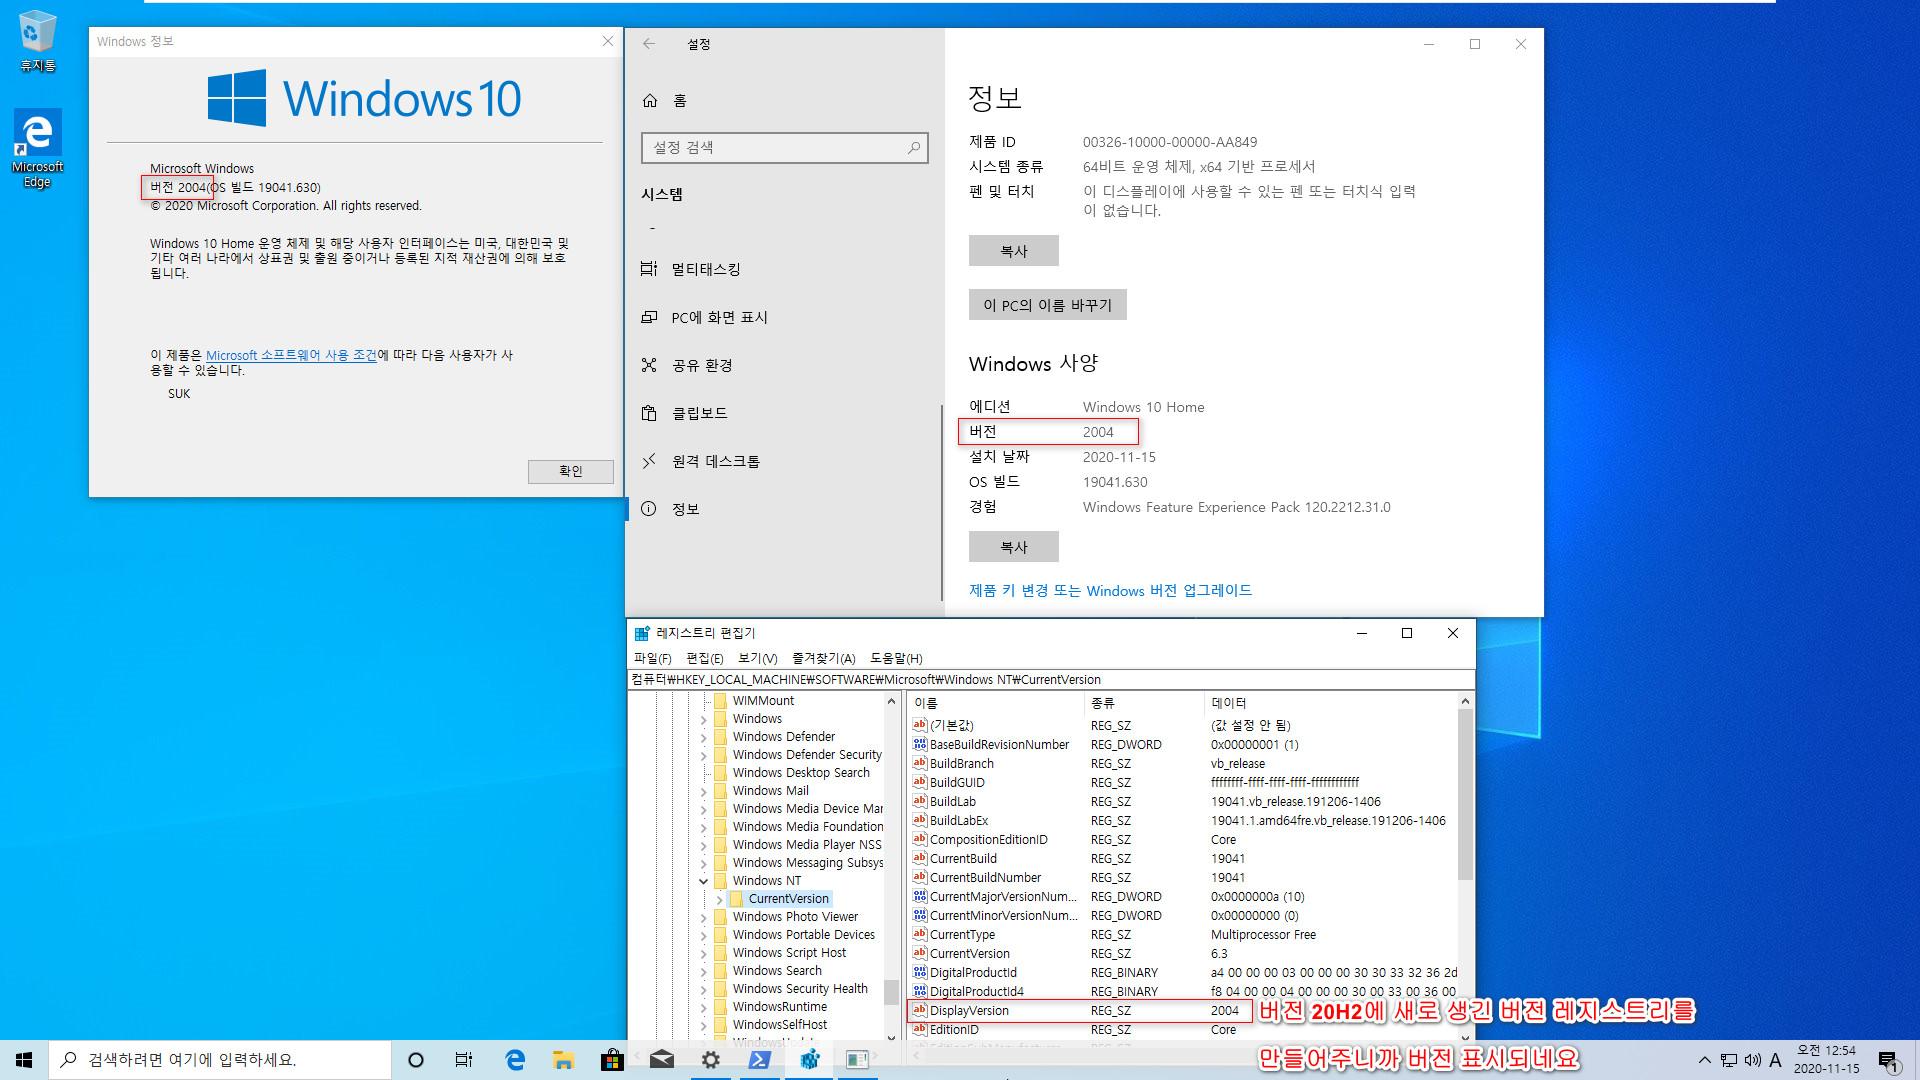 Windows 10 버전이 표시 되어 있지 않을 때, 버전 표시하기.bat 테스트 - Windows 10 버전 2004 윈도우 중에 버전이 표시되지 않는 윈도우가 있어서 만들게 됨 2020-11-15_005407.jpg